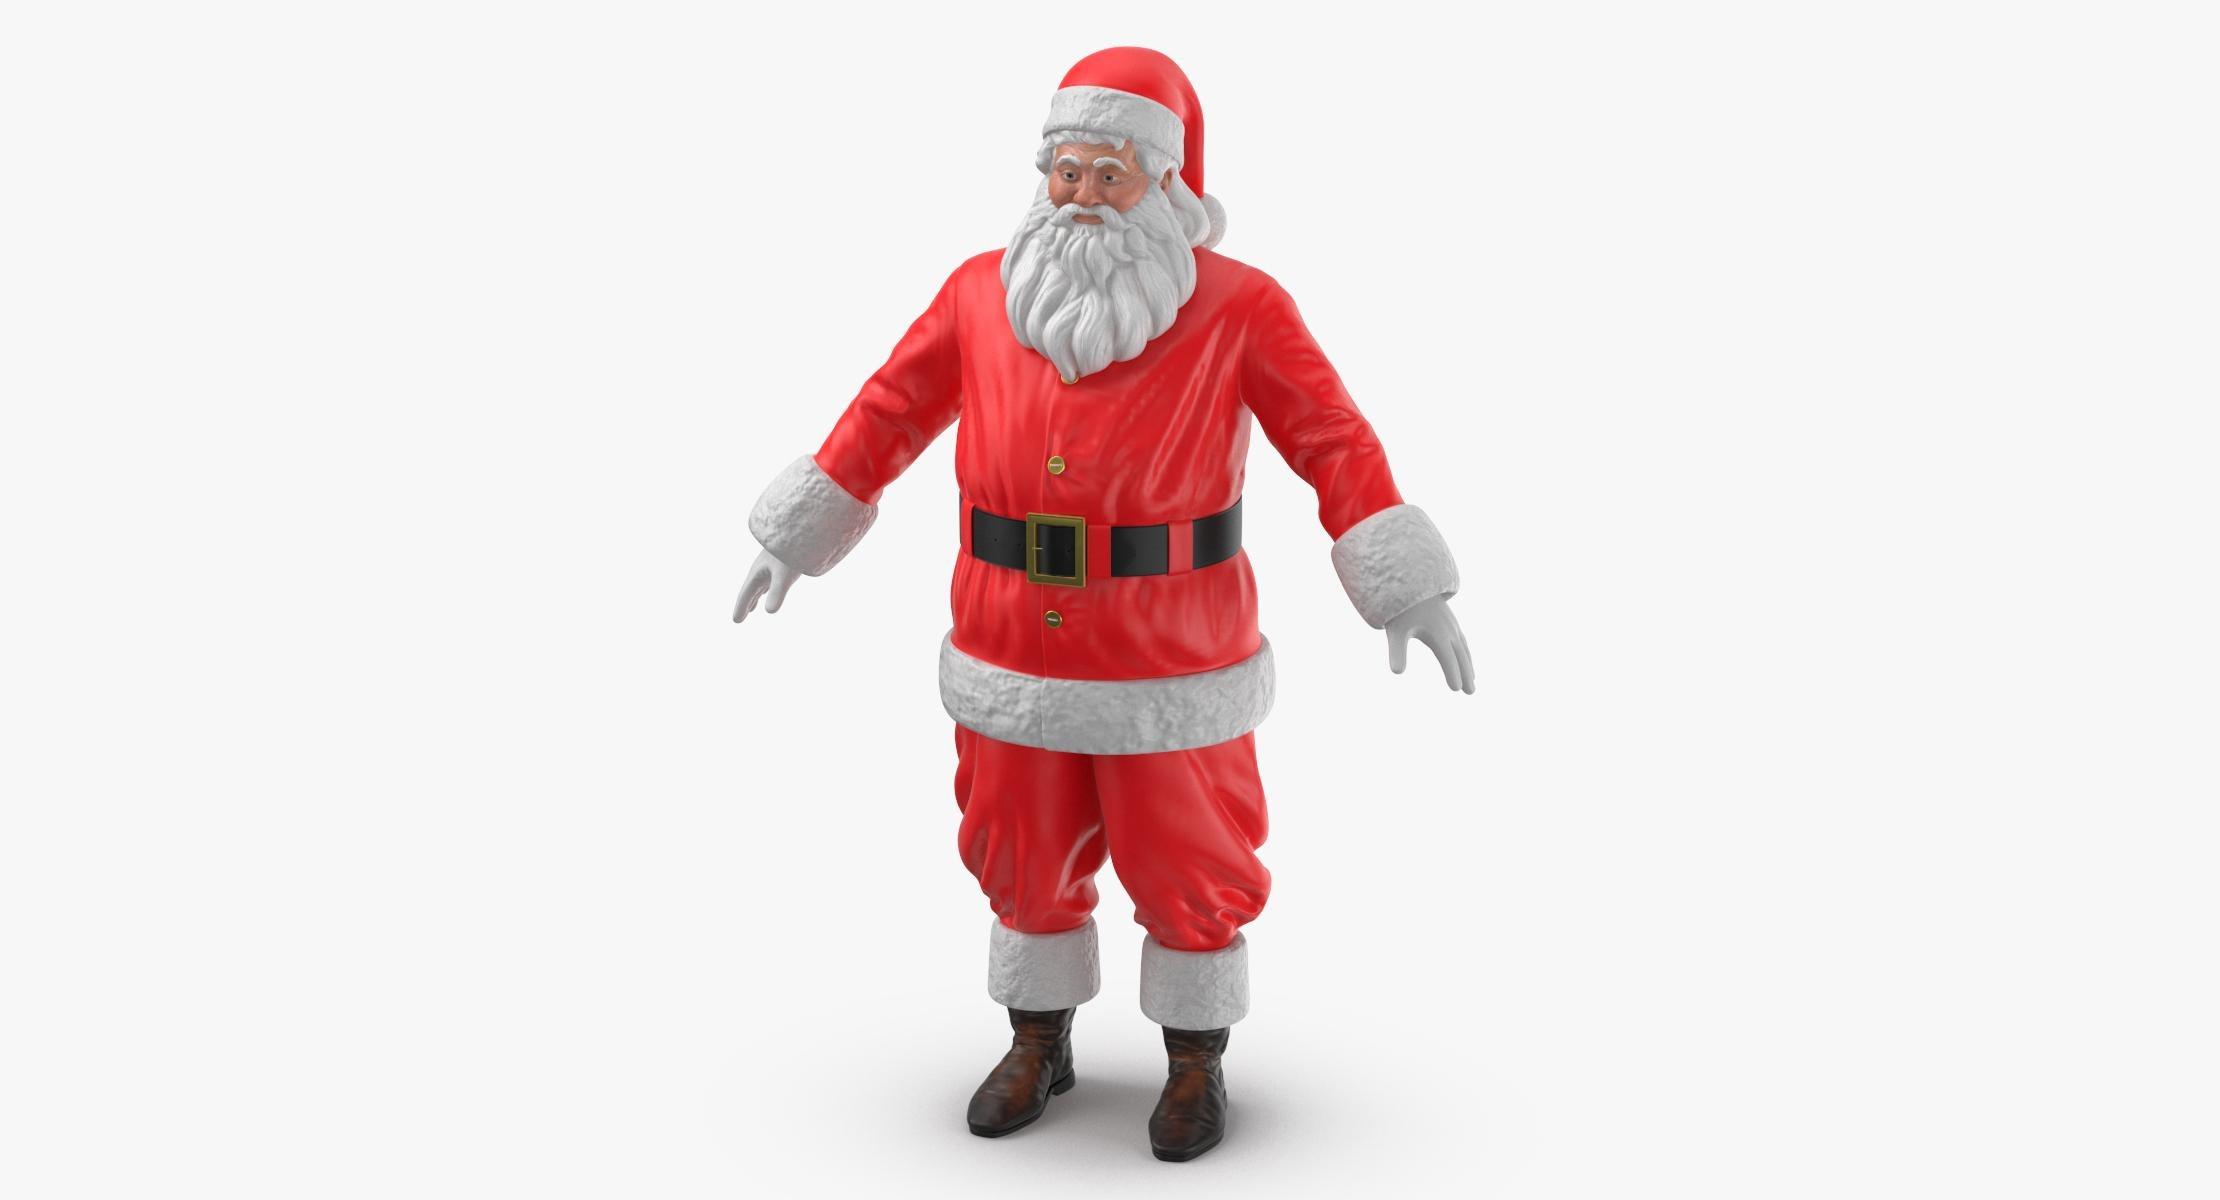 Santa Claus Figure A Pose - reel 1